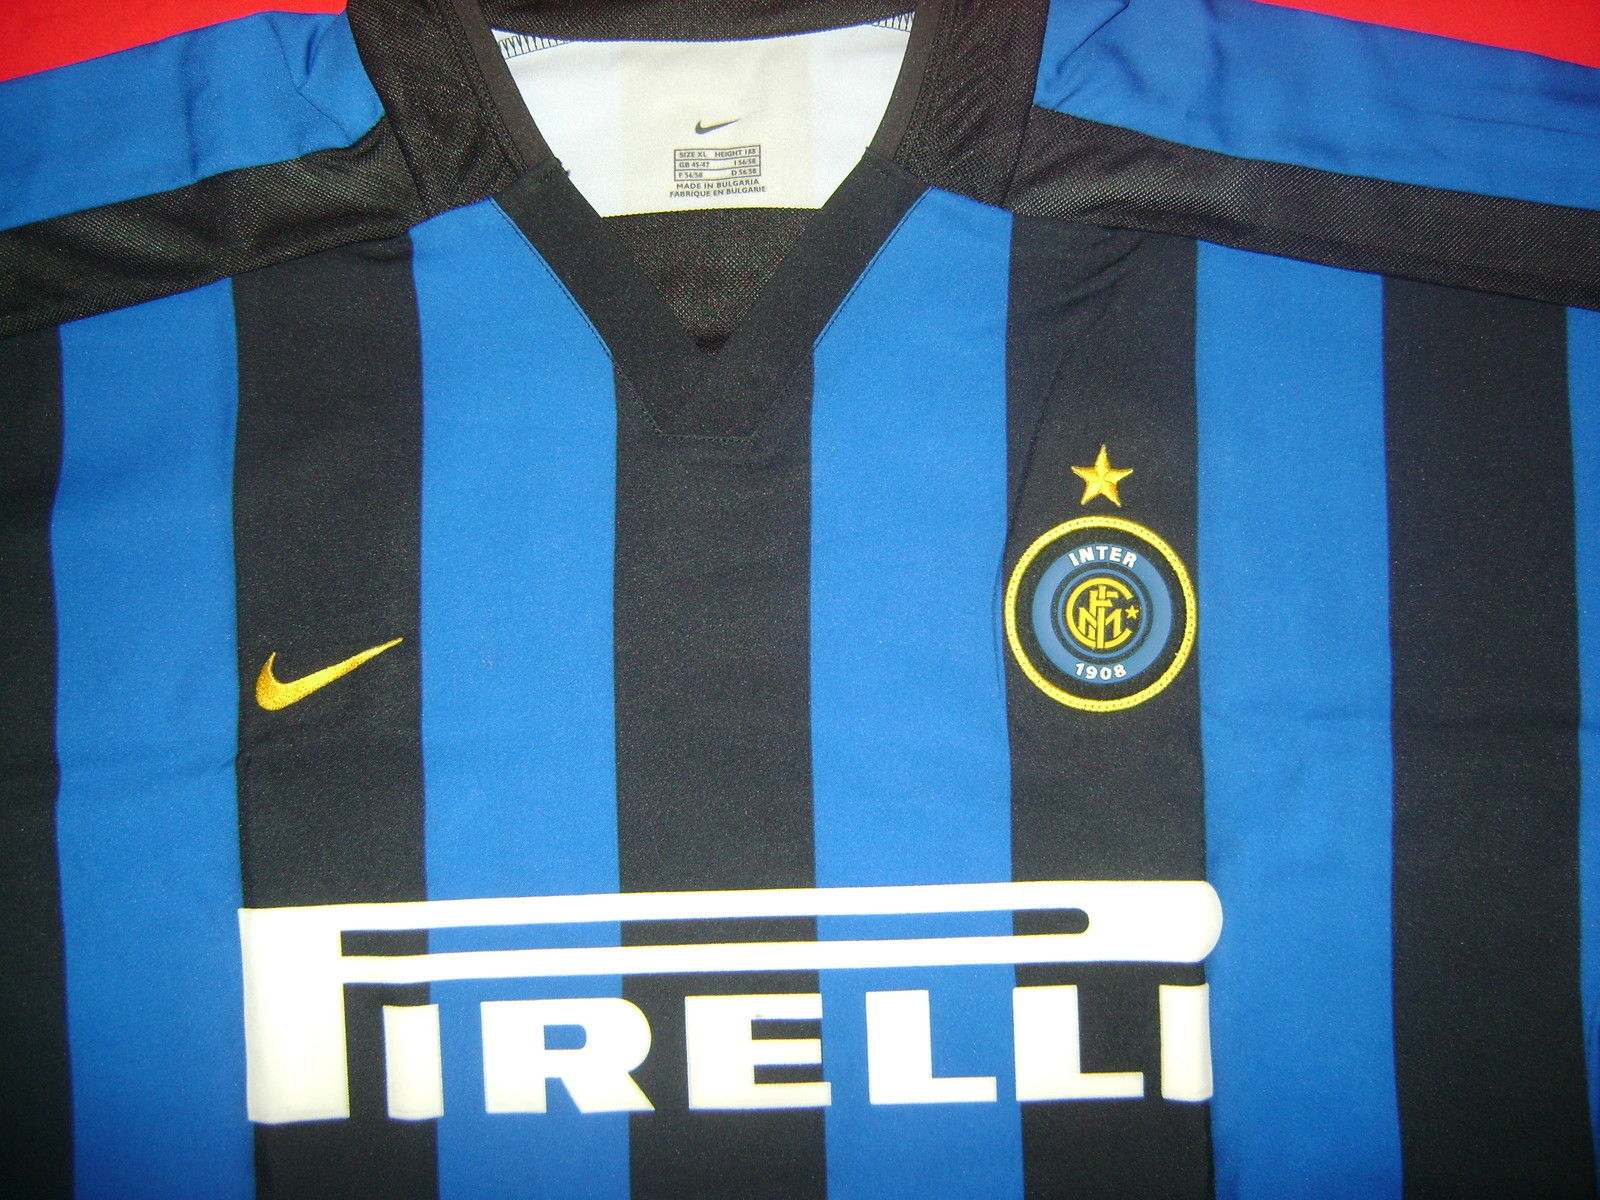 6d1186fc NIKE INTER MILAN HERNAN CRESPO HOME JERSEY FOOTBALL 2002/03 X-LARGE.